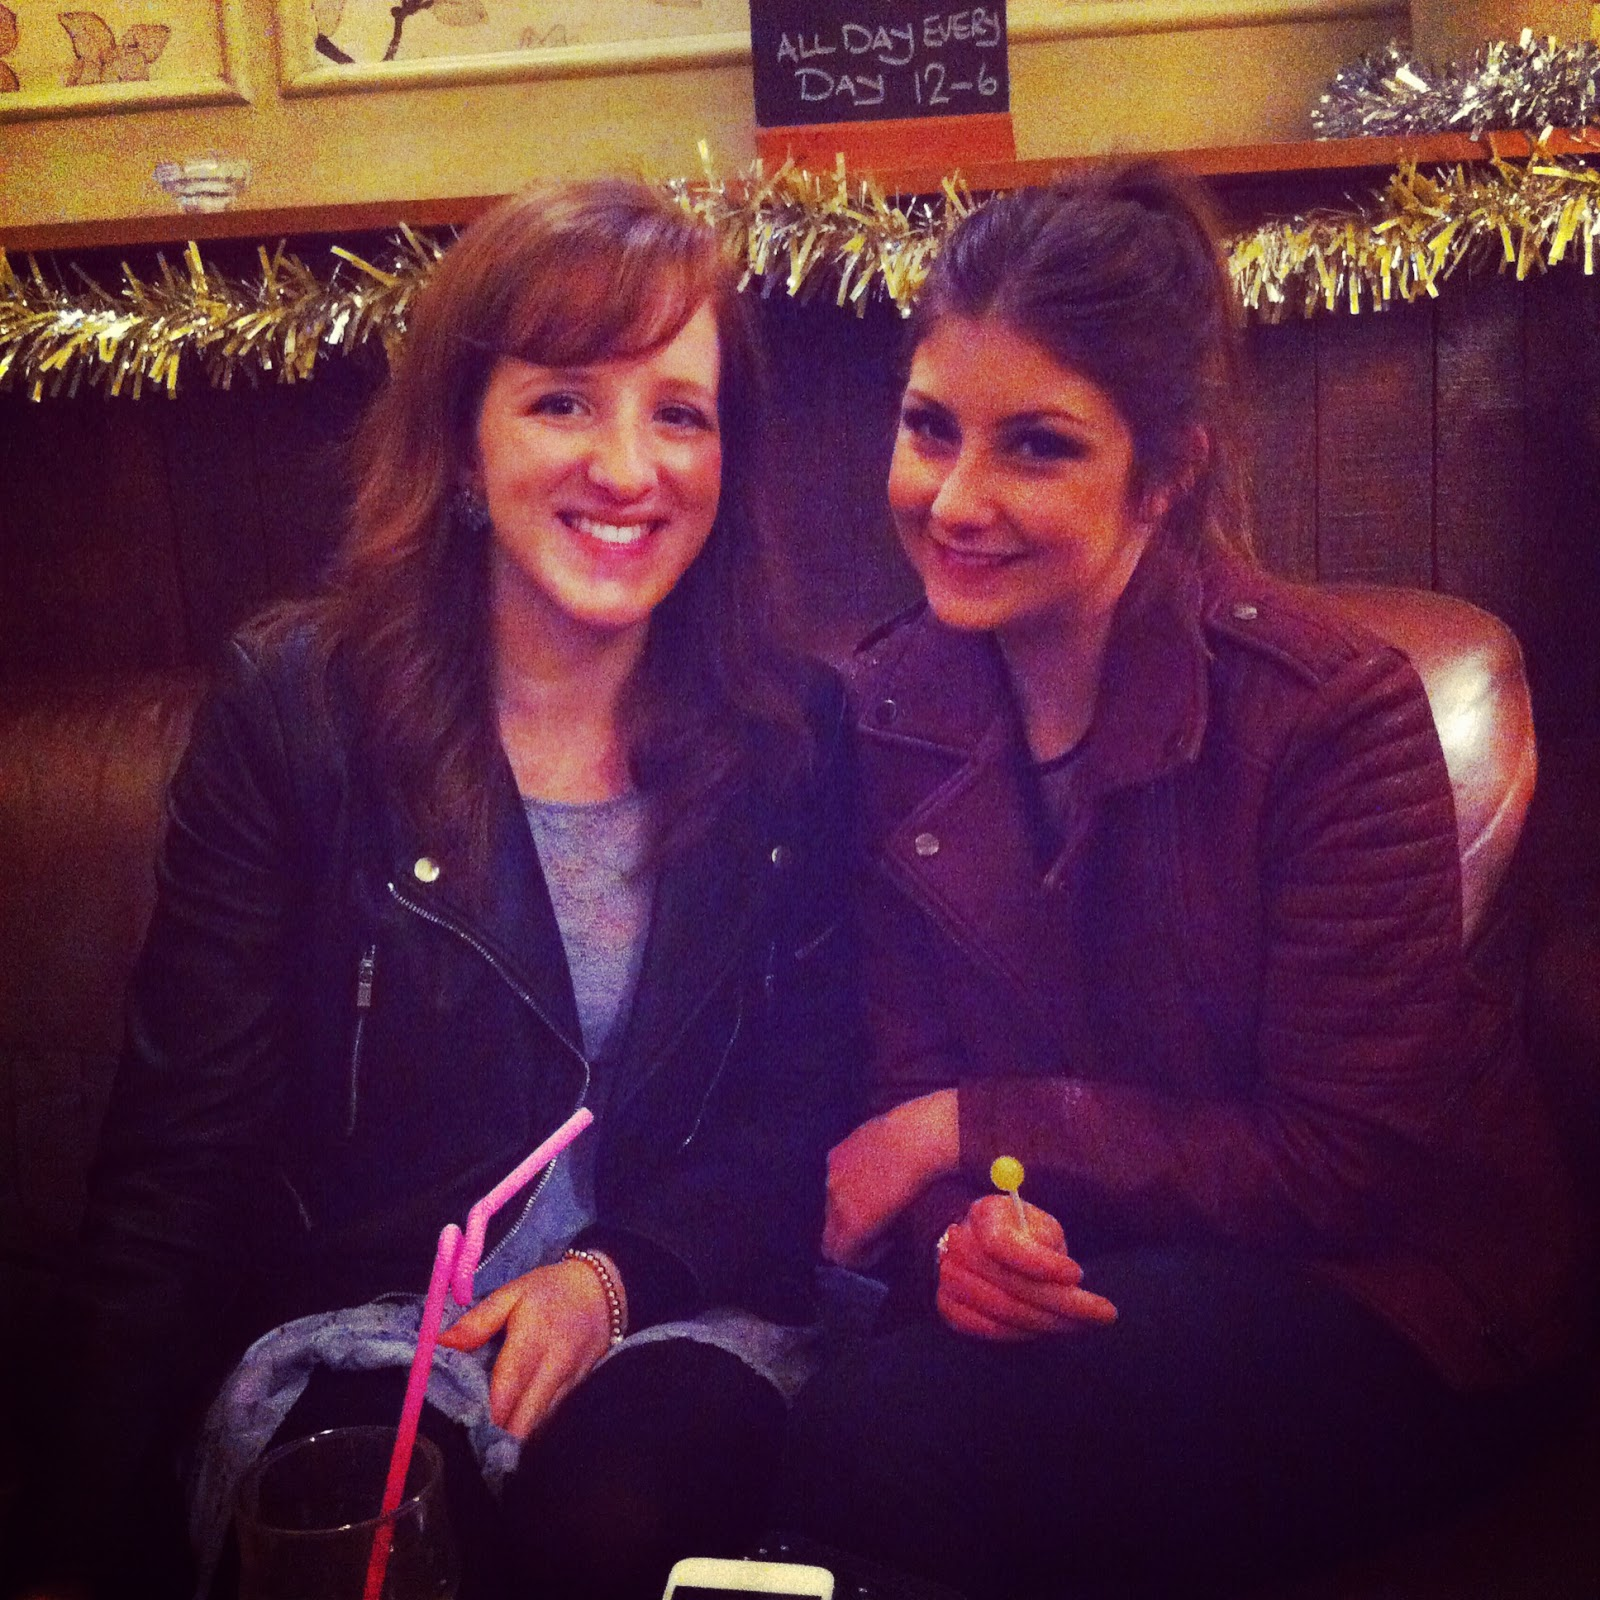 Instagram: RhiannonBlog New Years Eve